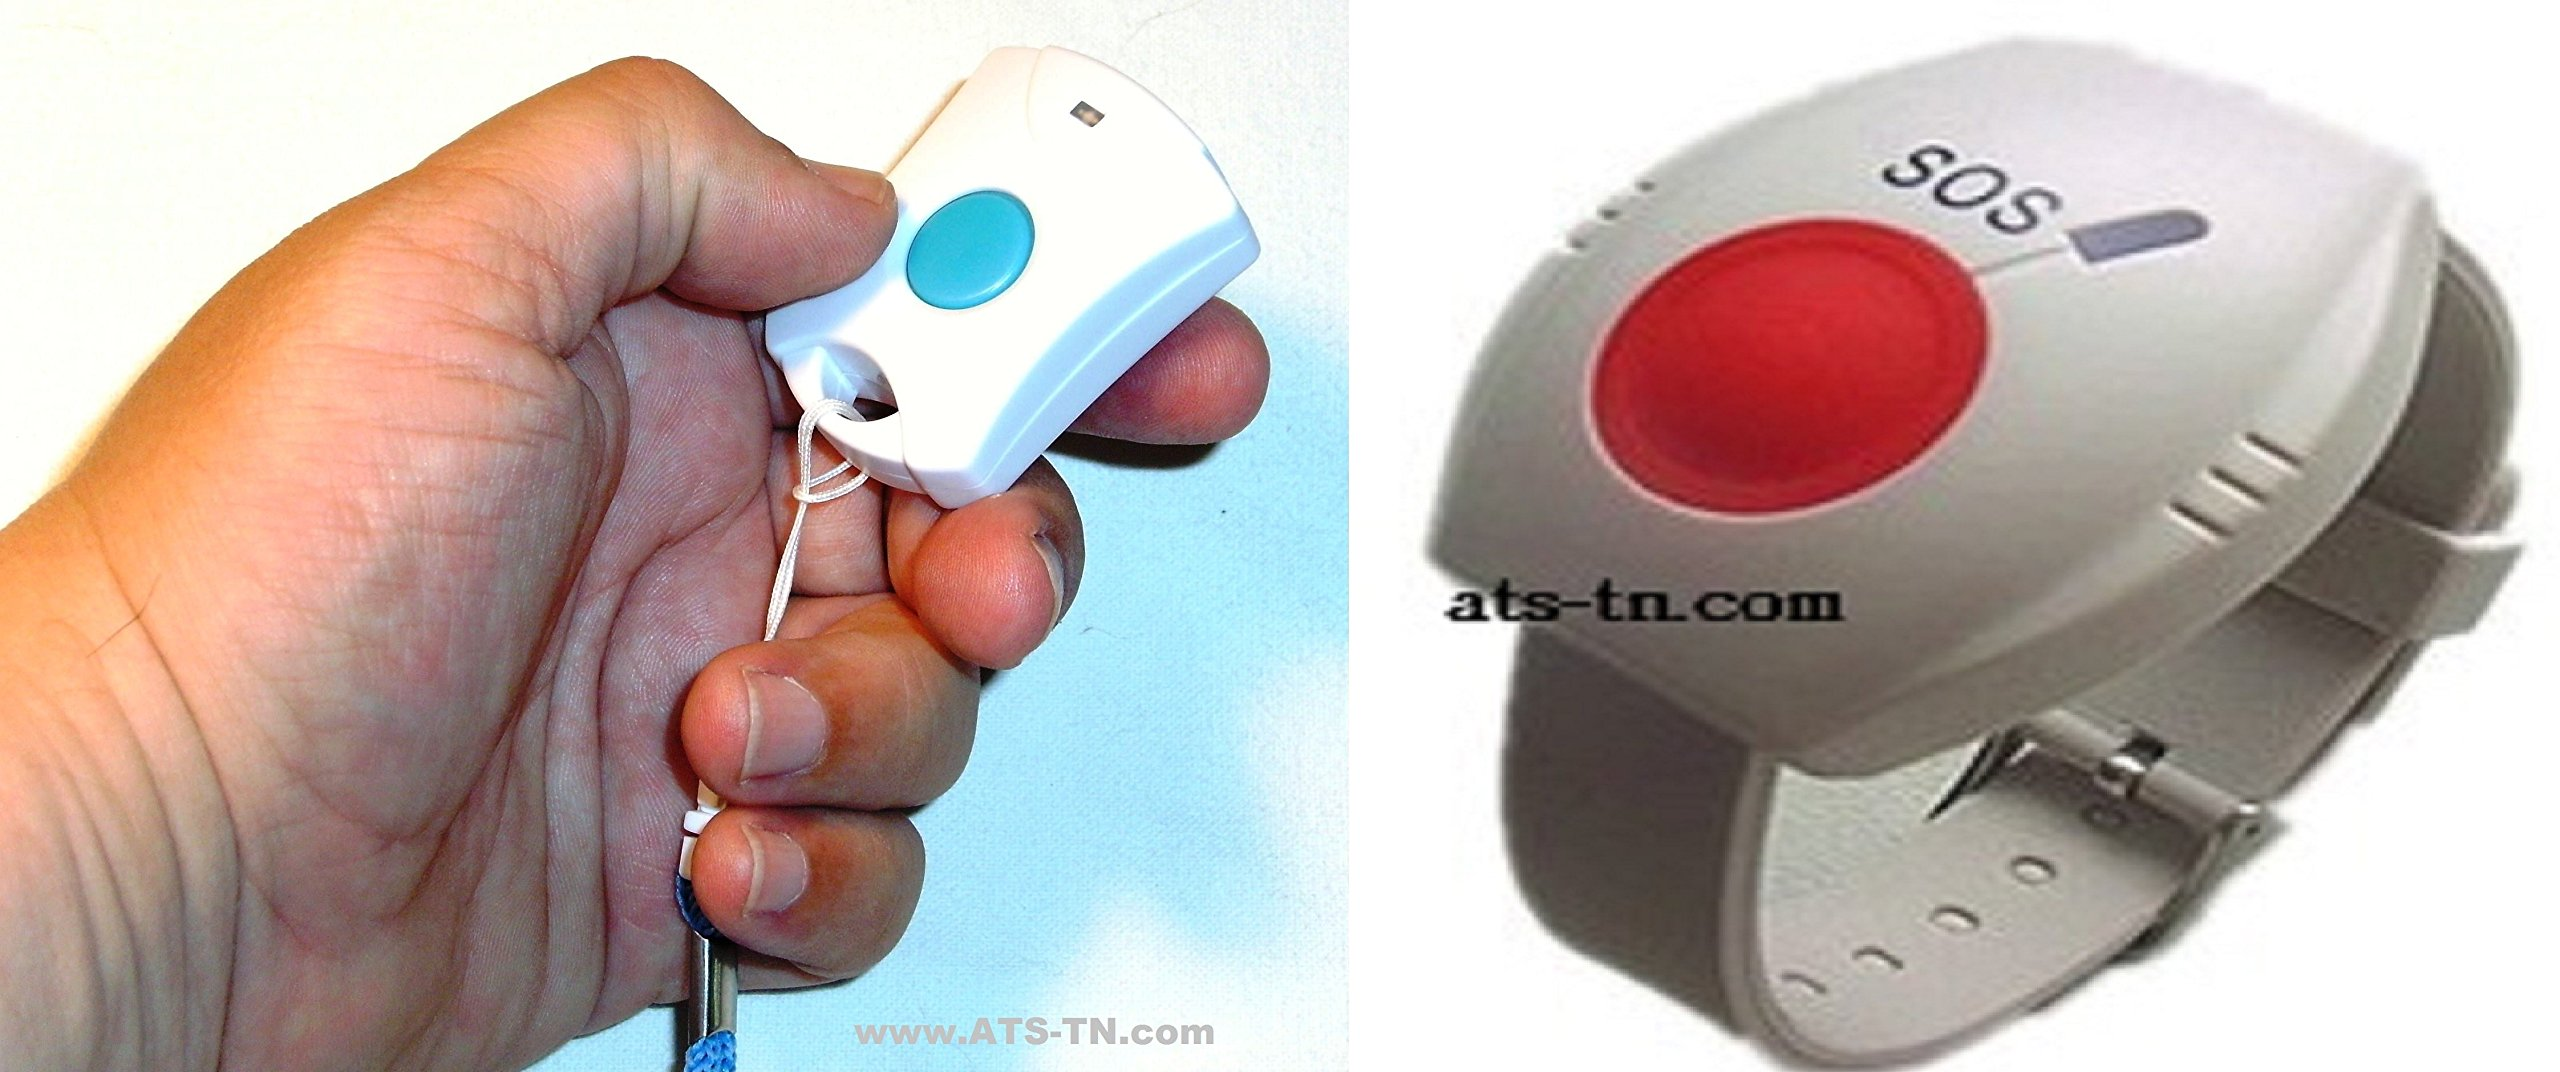 Senior HELP Dialer Medical Alert - No Monthly Fees Medical Alert System- HD700 by Ats